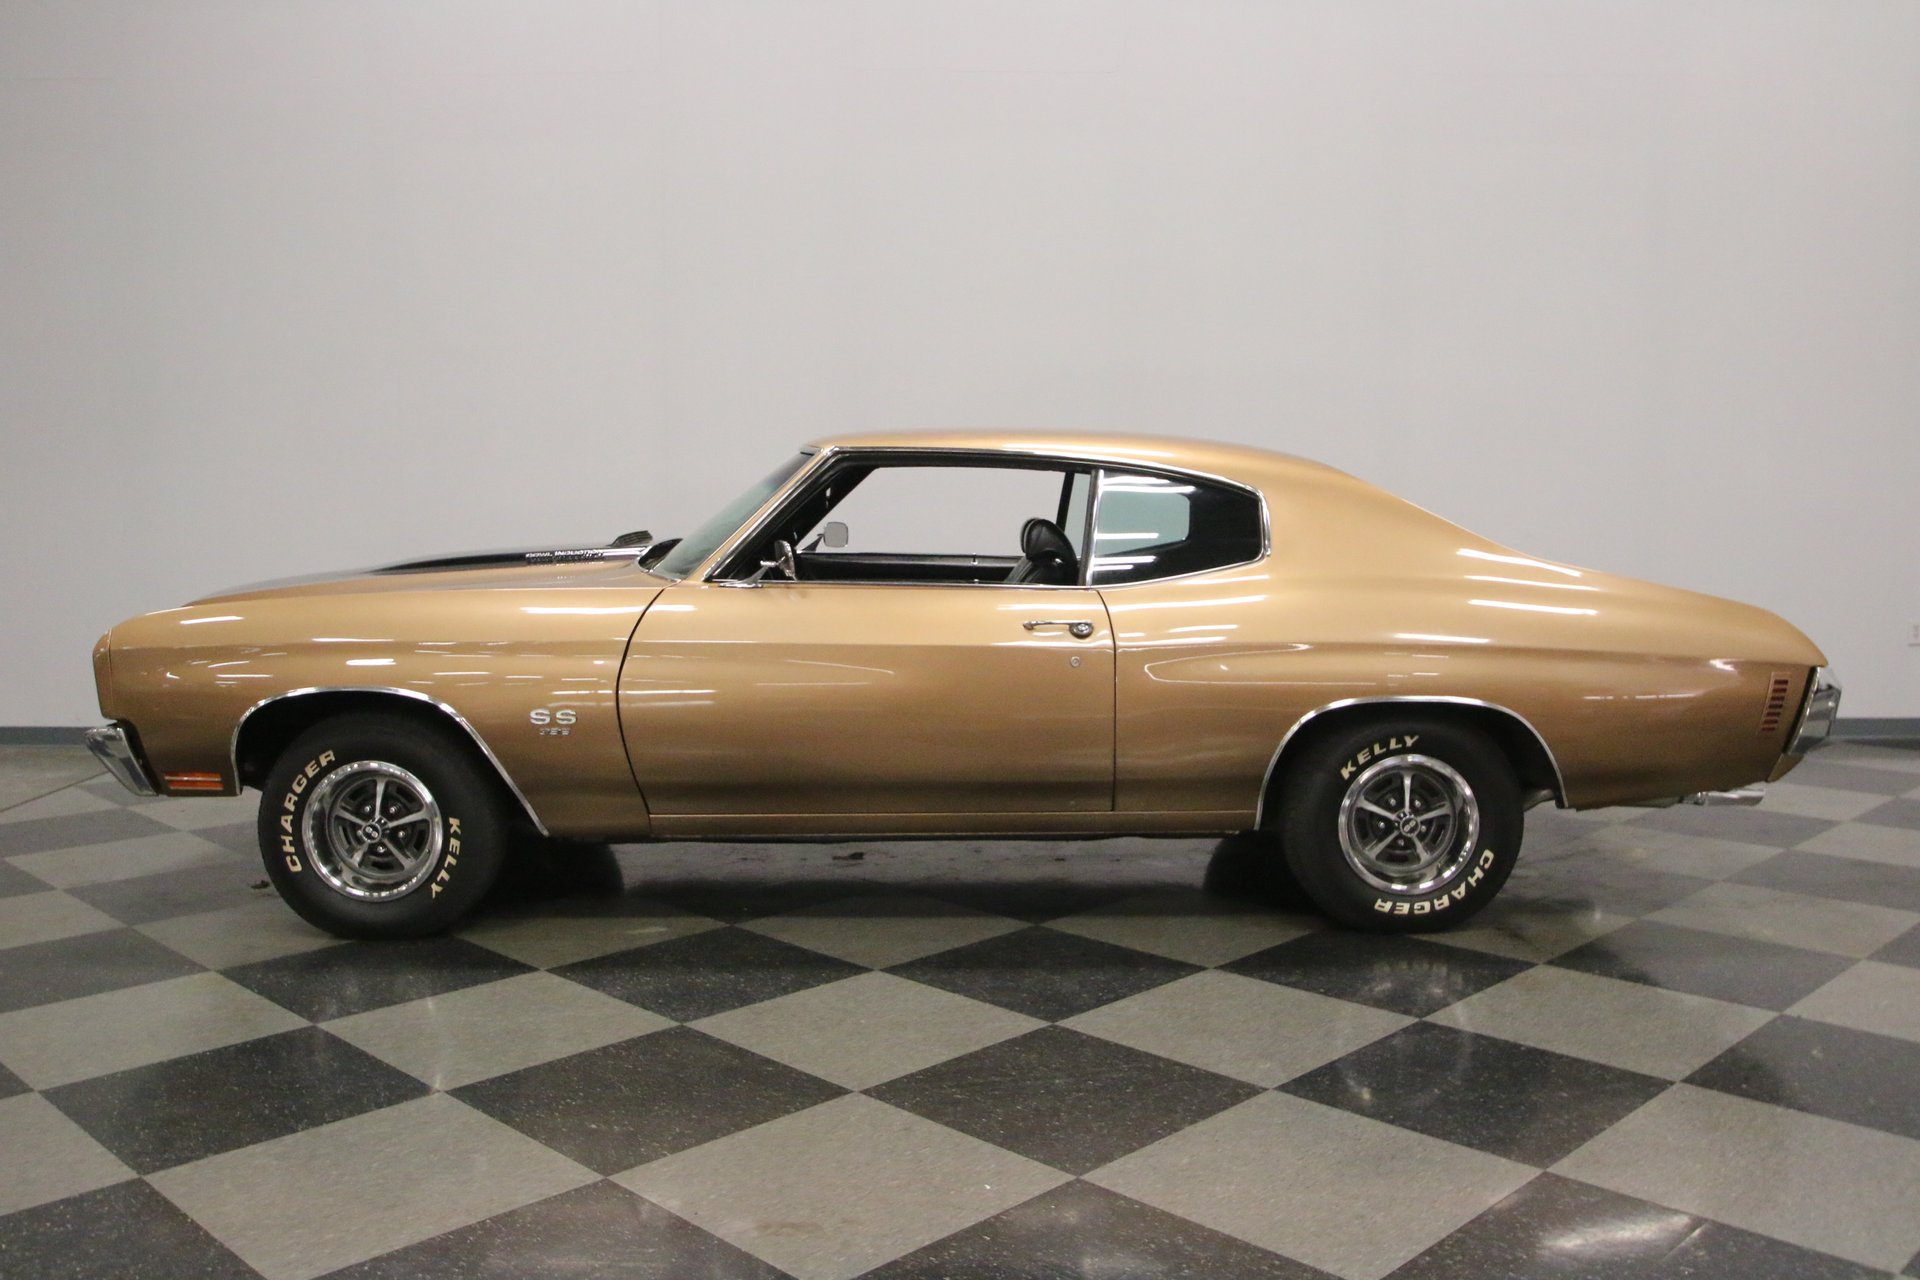 1970 chevrolet chevelle ss 396 tribute